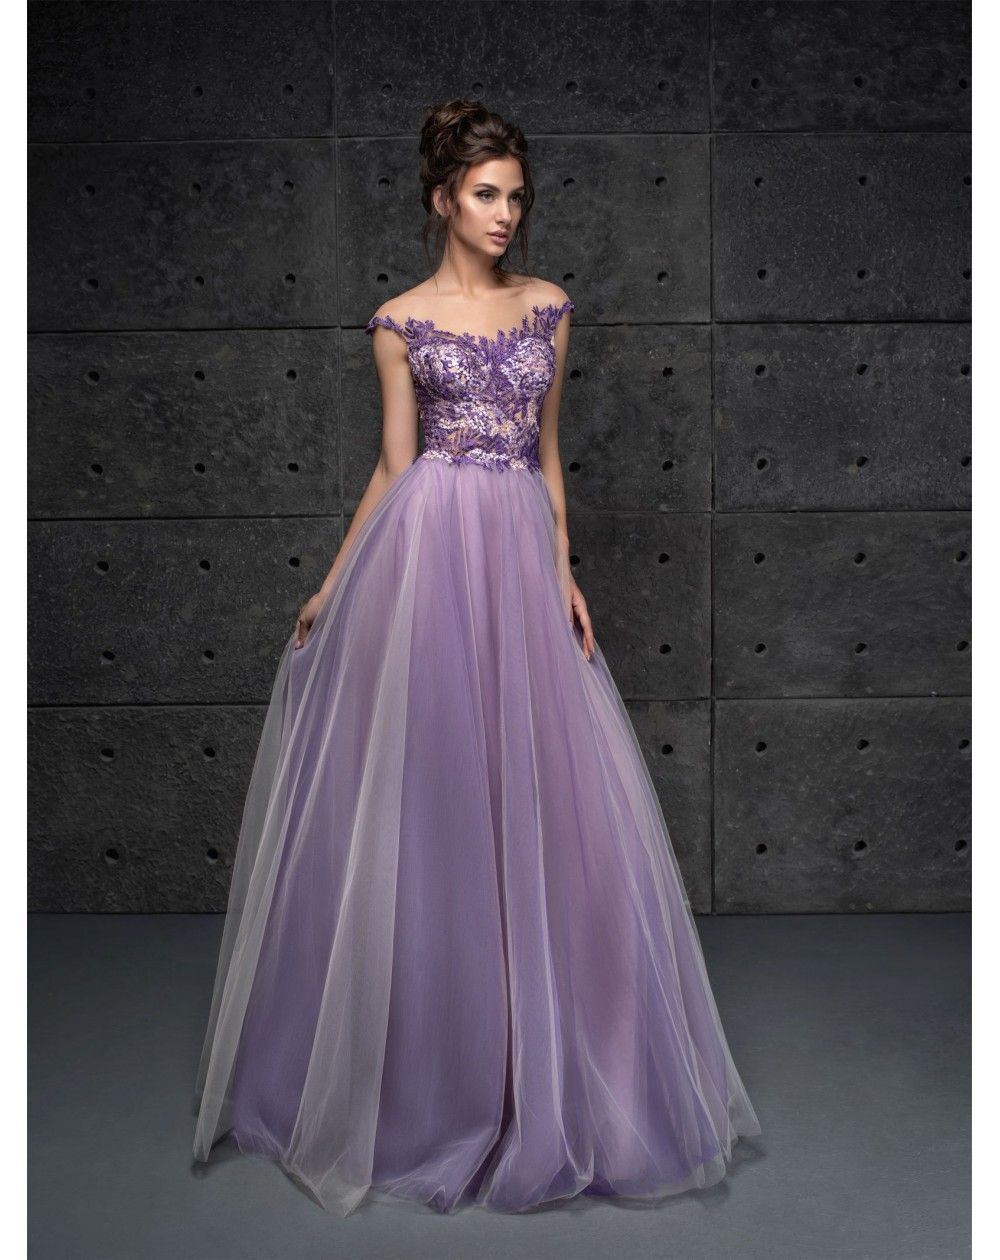 4d3c1fb9174a Dlhé fialové luxusné spoločenské šaty Frances vhodné na ples